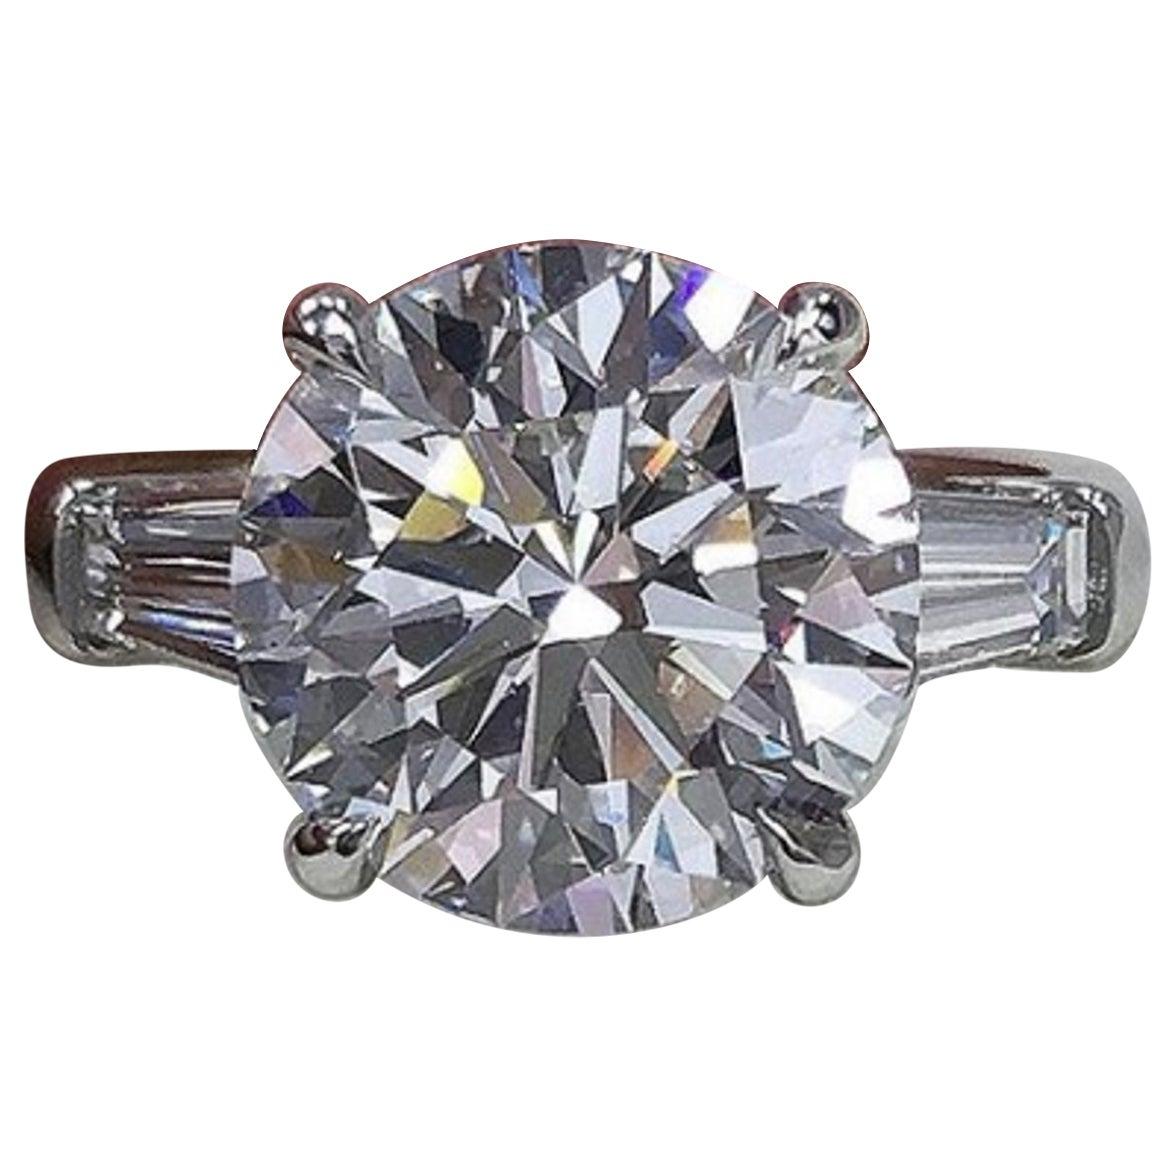 GIA Certified 5.50 Carat Round Brilliant Cut Trapezoid Diamond Ring